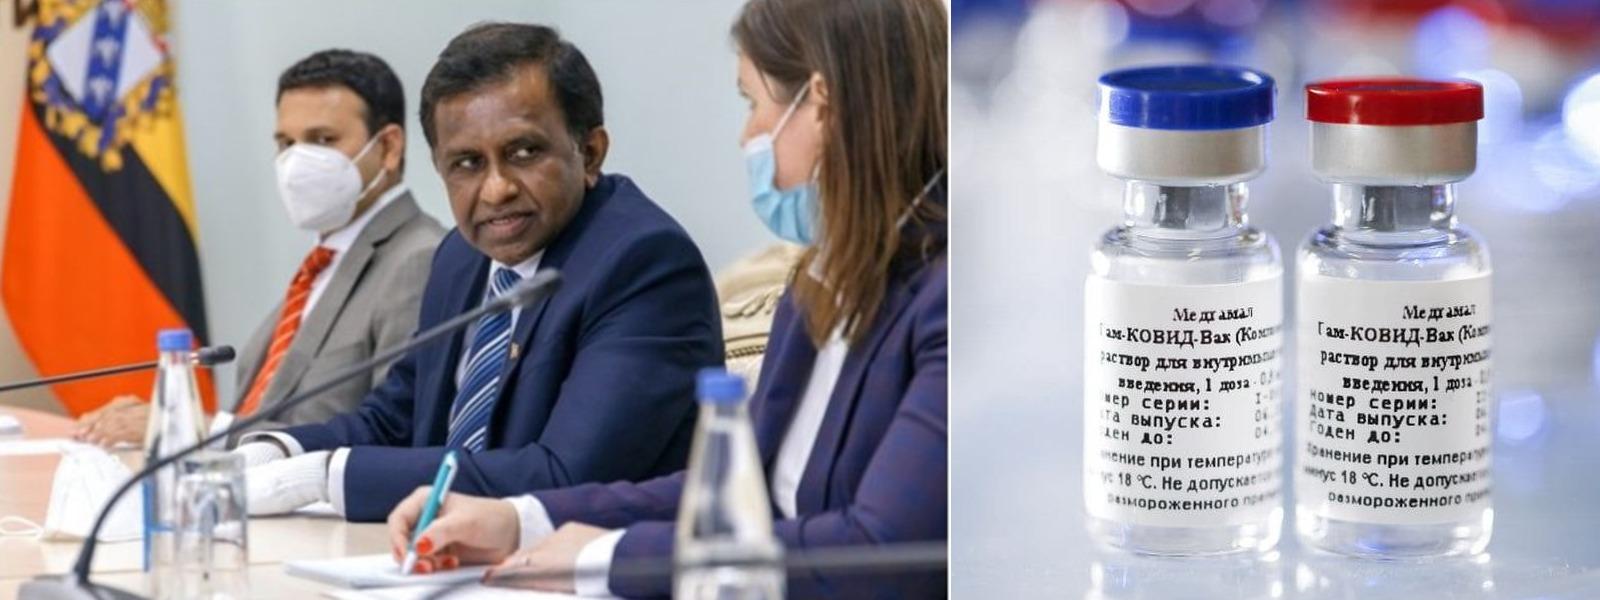 Sri Lanka's Ambassador to Russia Plans On Getting Vaccinated With Sputnik V